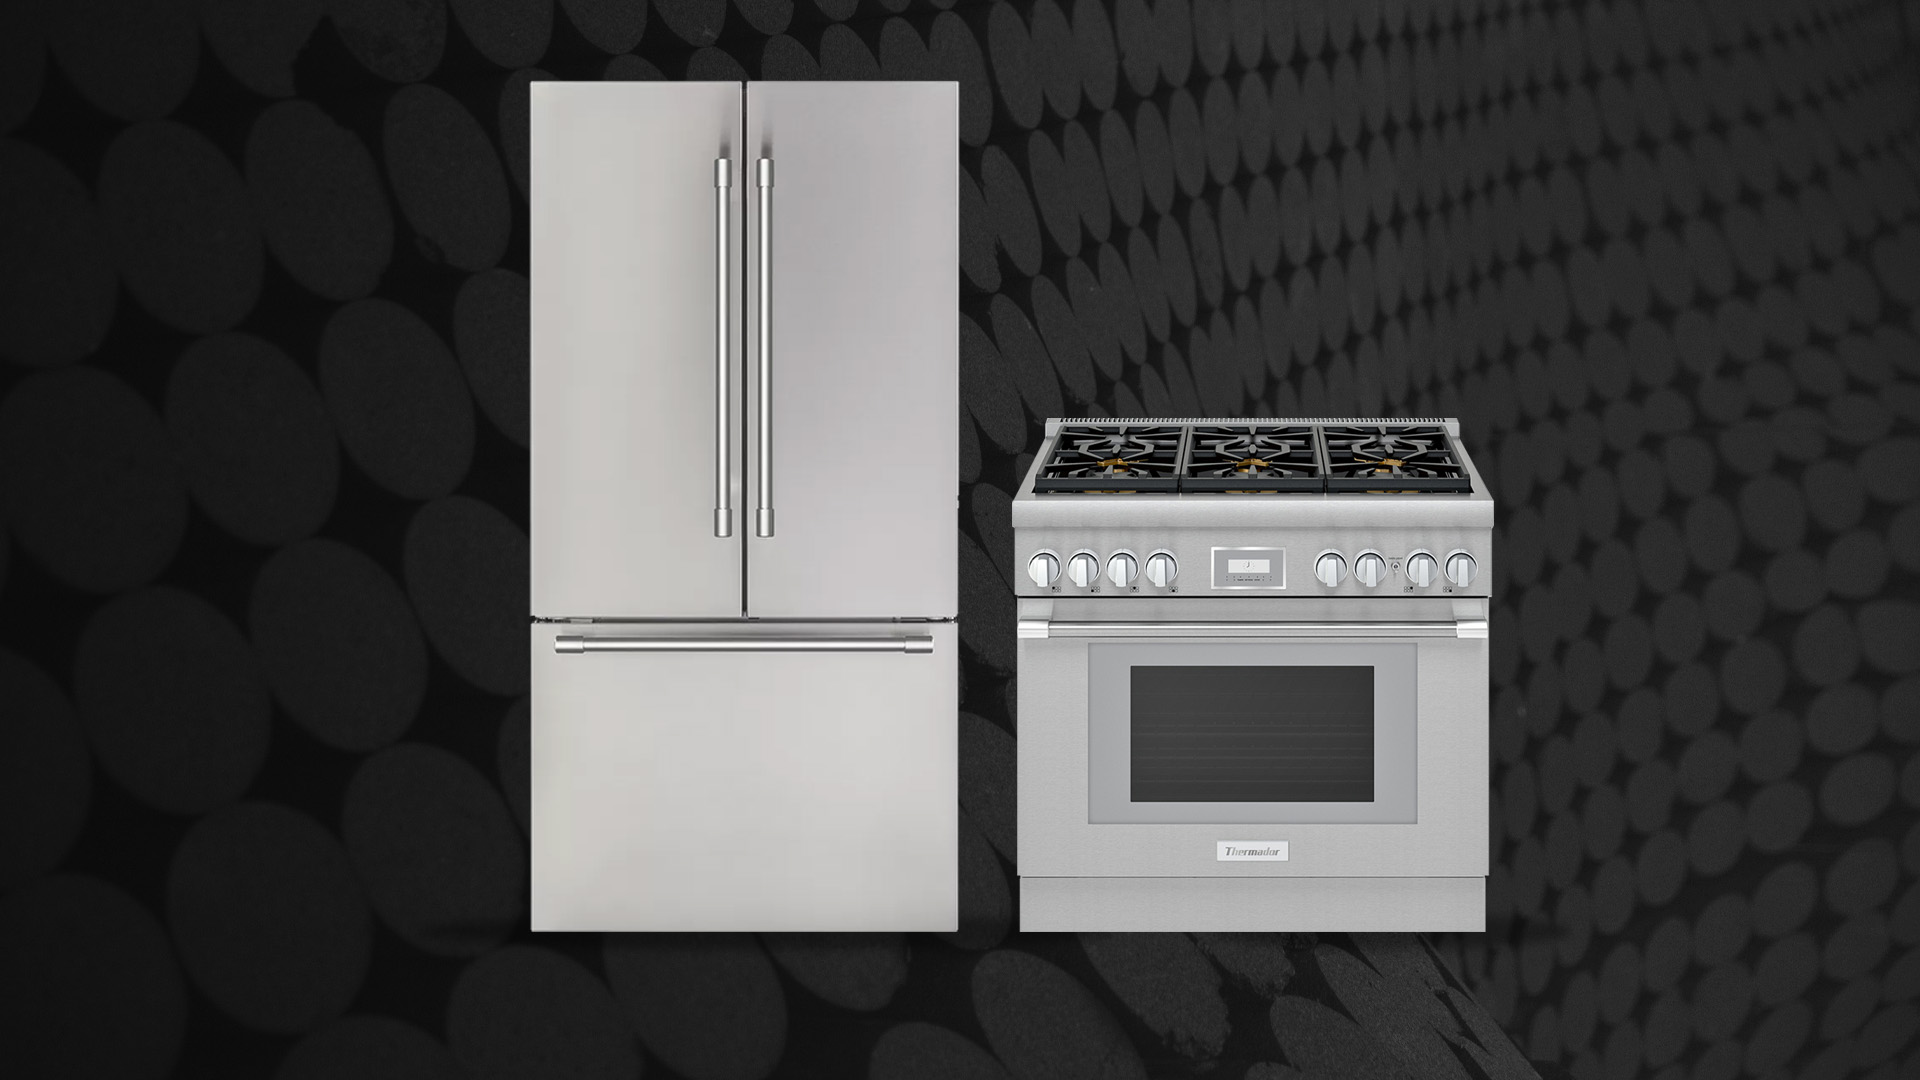 Thermador Appliance Repair Service Boston | Thermador Appliance Repair Pros